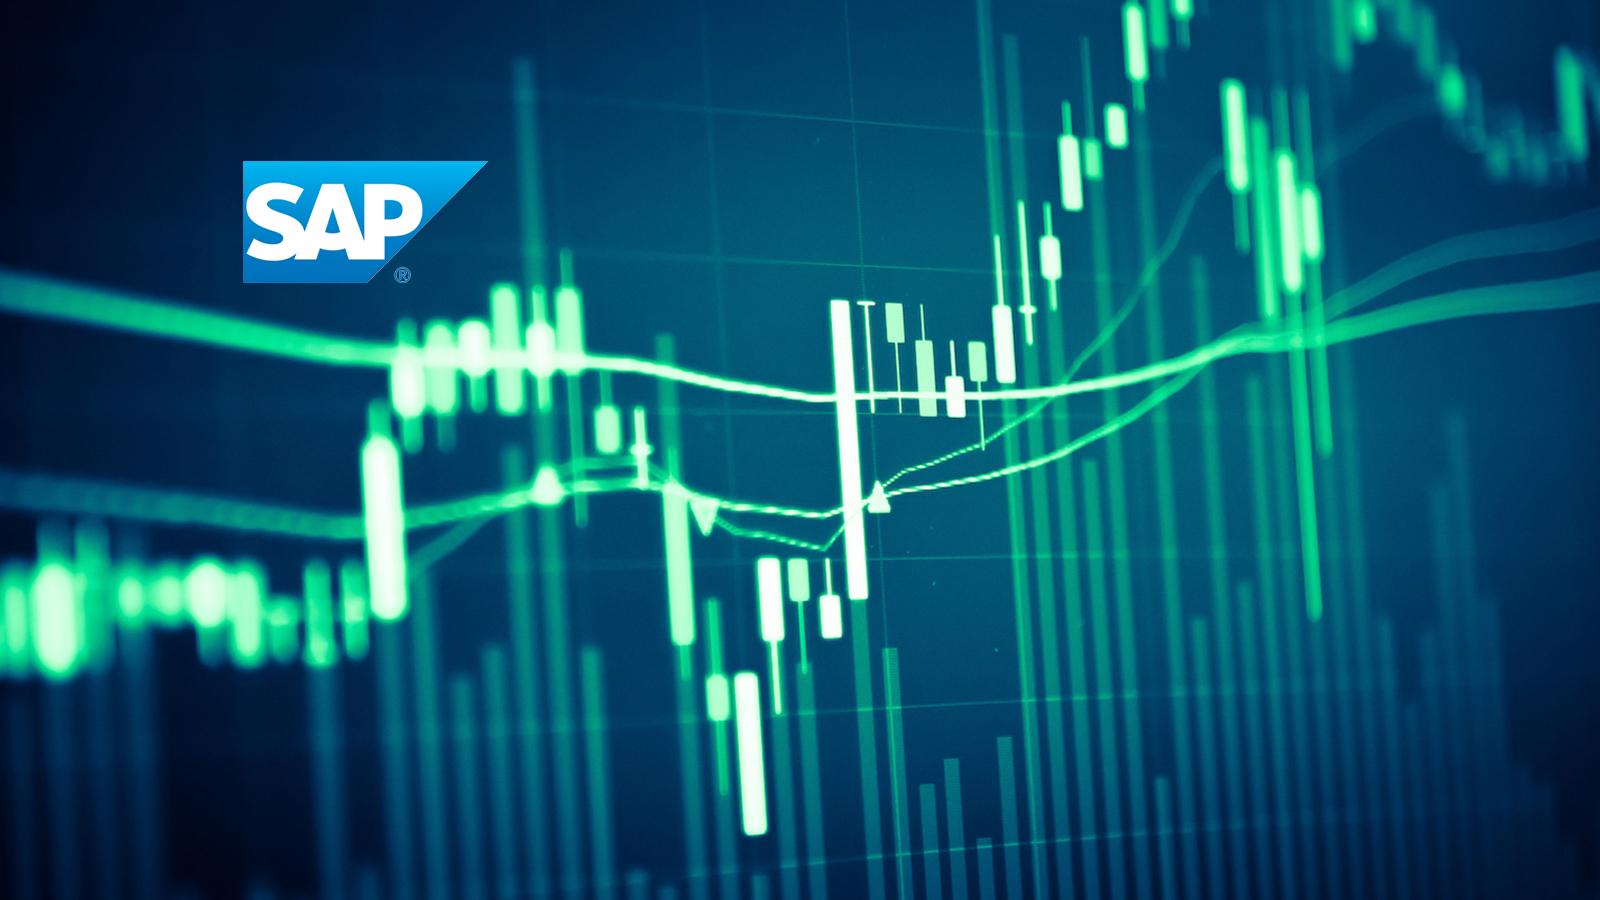 SAP Leonardo Unveils Latest Machine Learning and Analytics Updates 1600x900